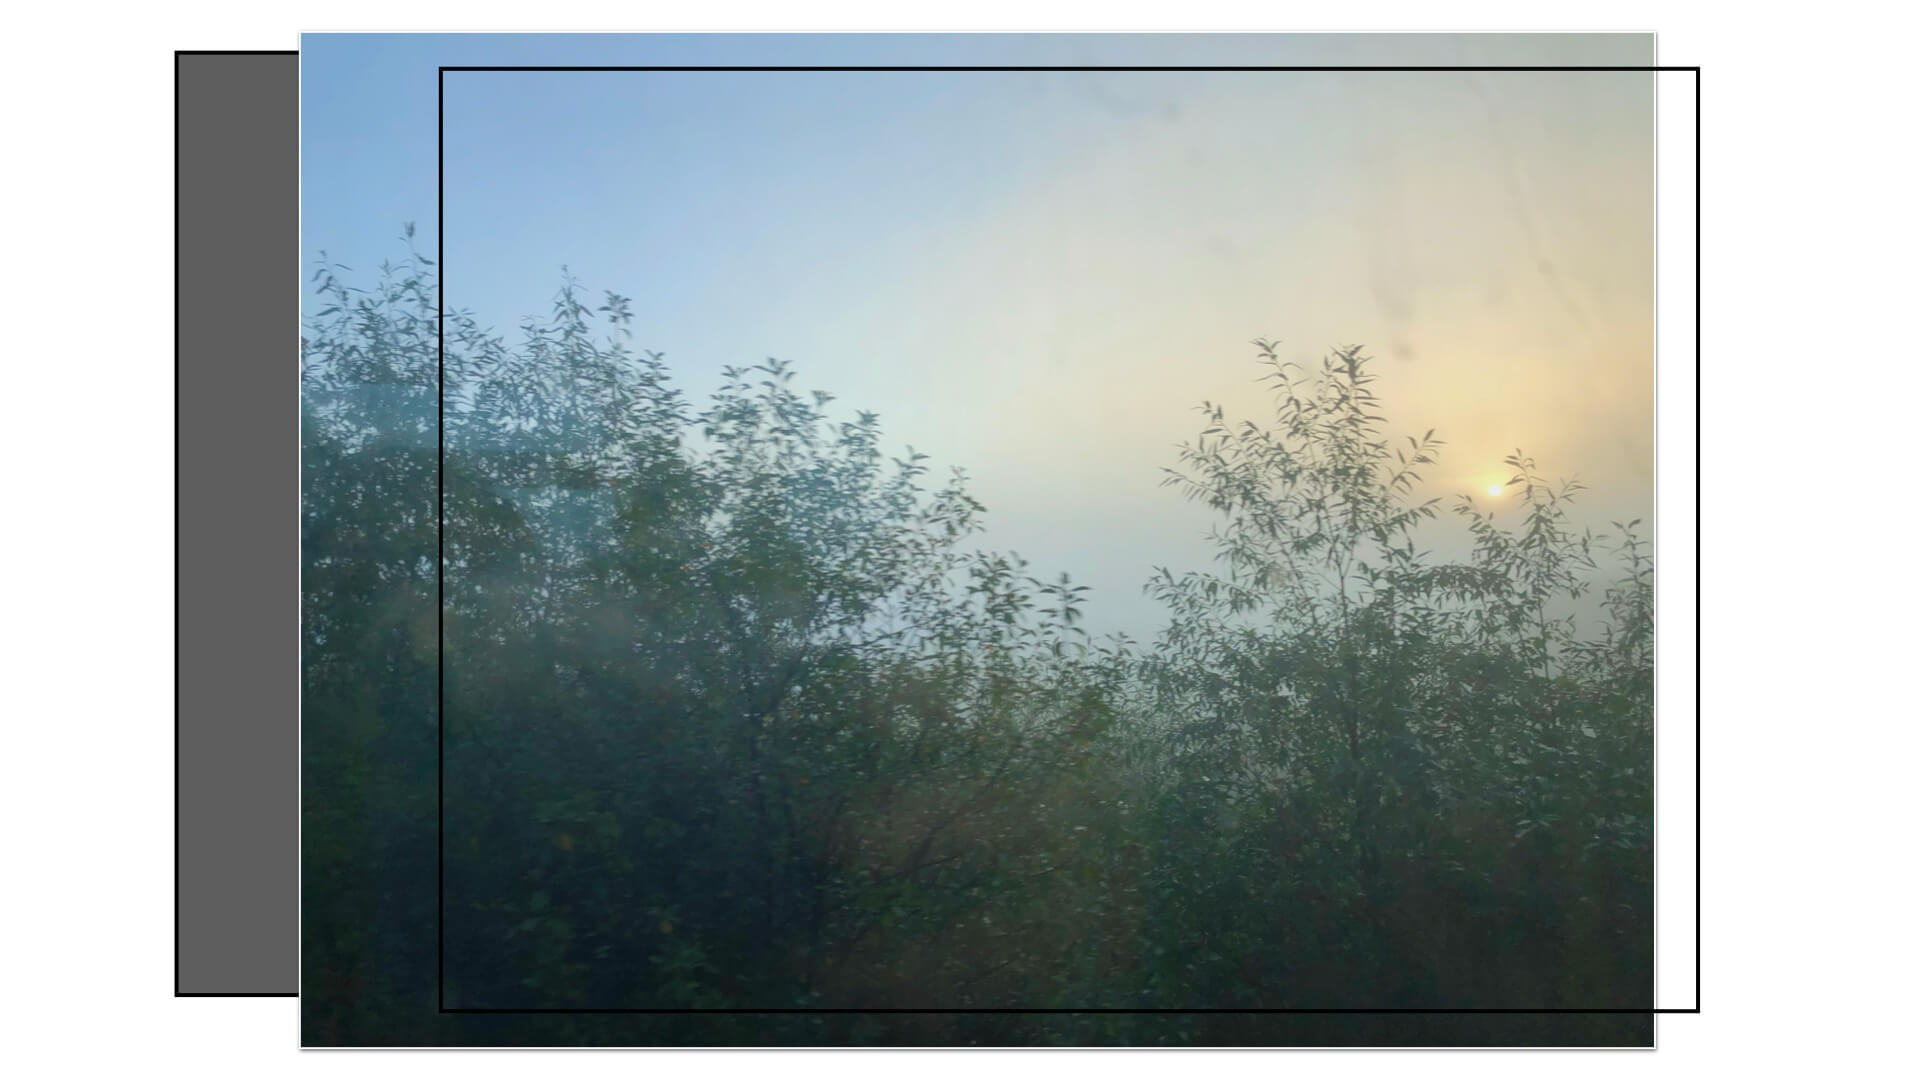 szbarnaus smudgy light experiment